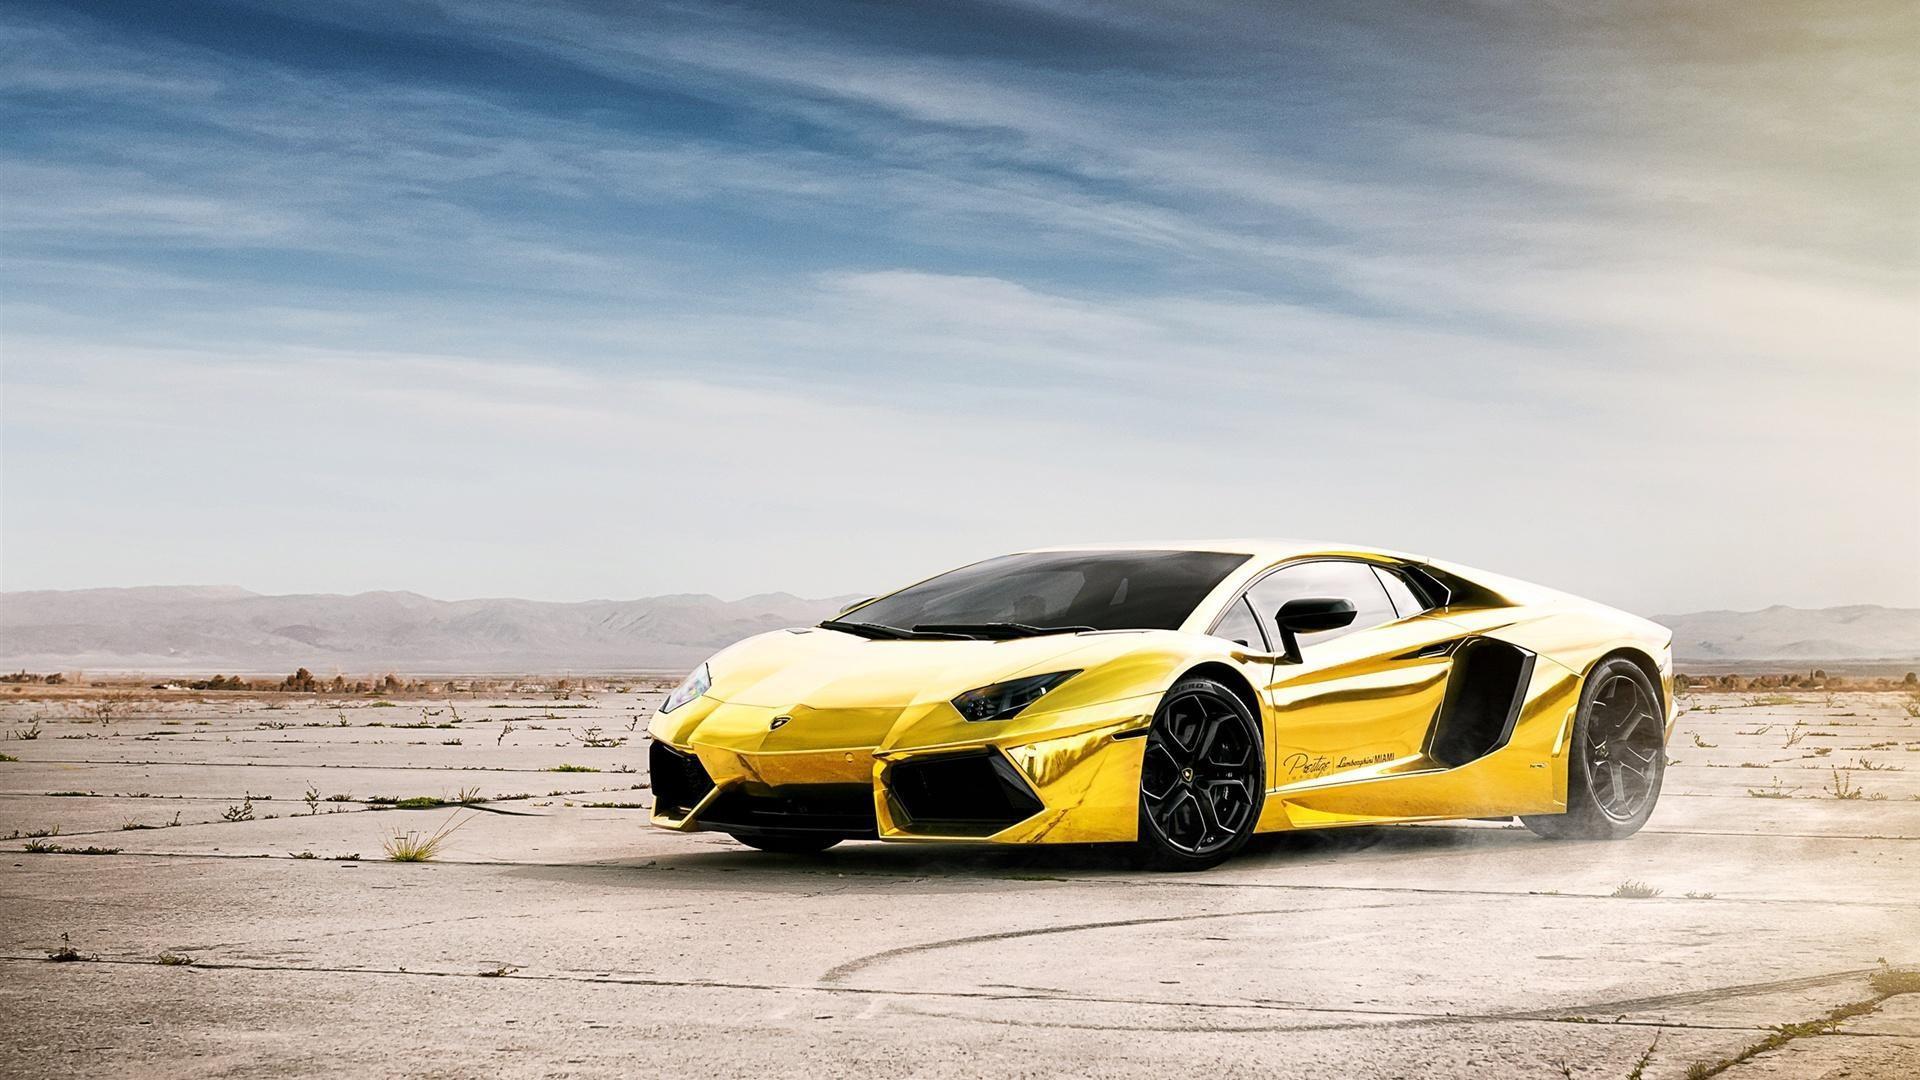 Res: 1920x1080, Gold Lamborghini Aventador Lp700